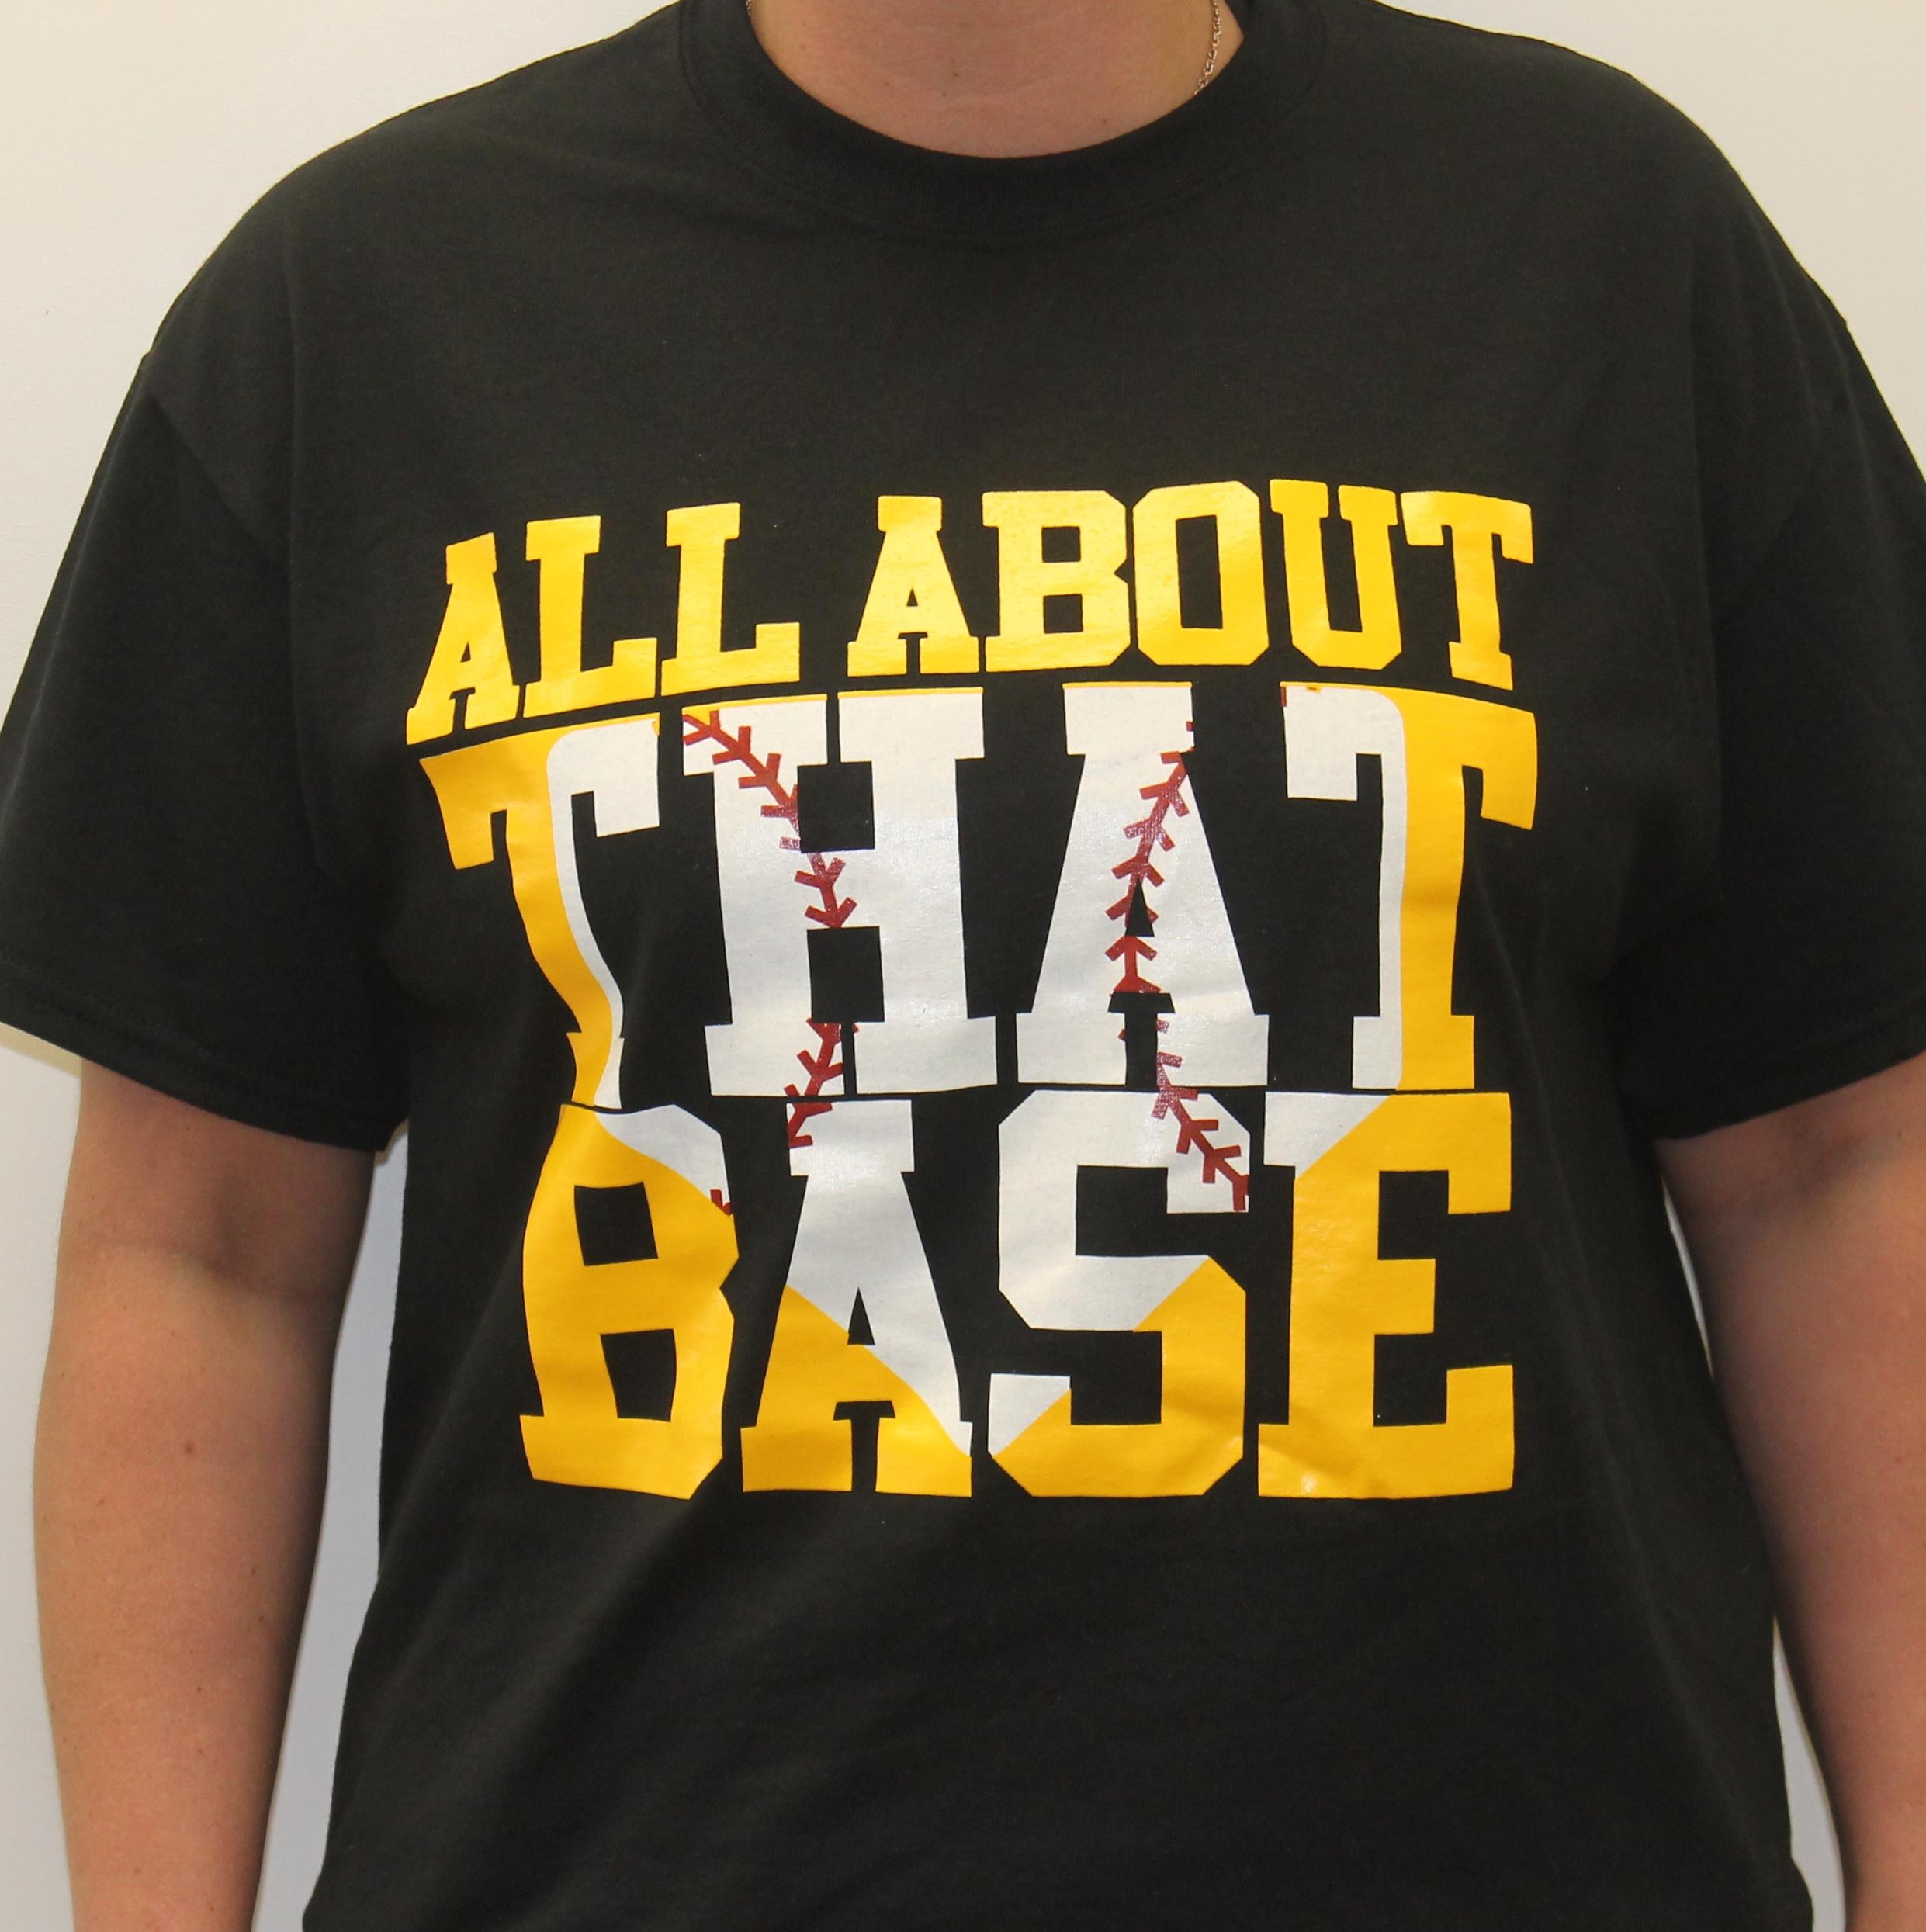 Fairfax Adult Softball